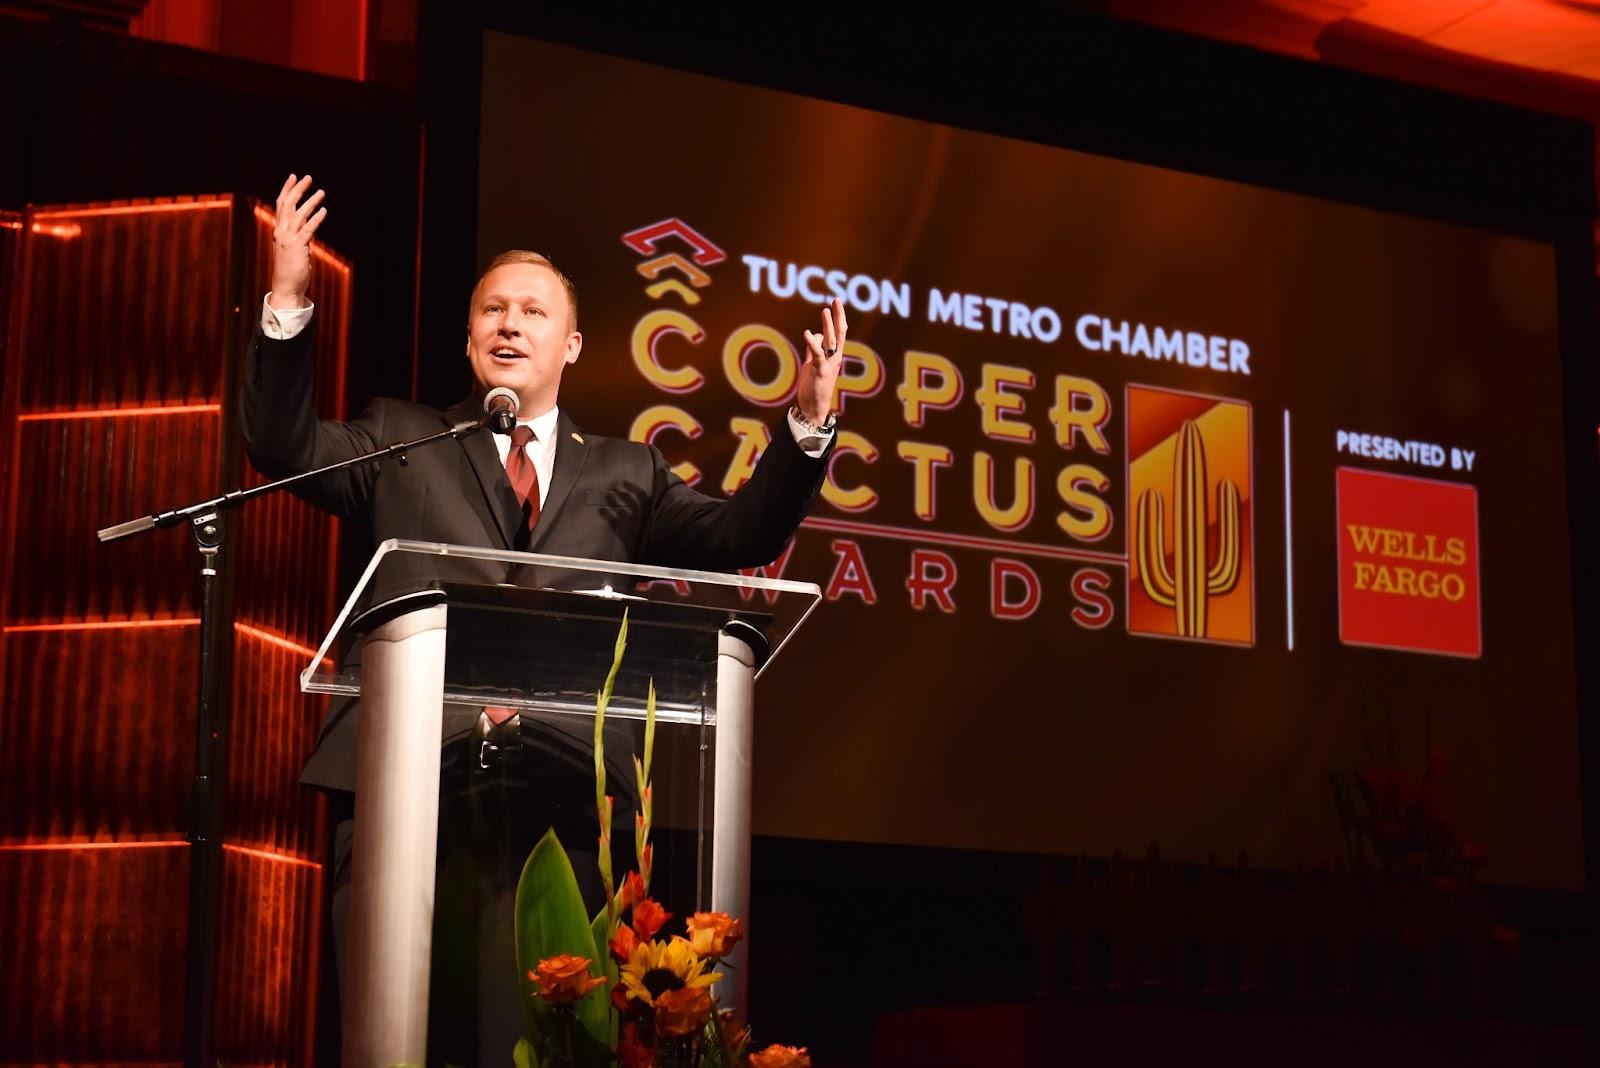 Copper Cactus 2015 - 150911-Chamber-CopperCactus-0379.jpg